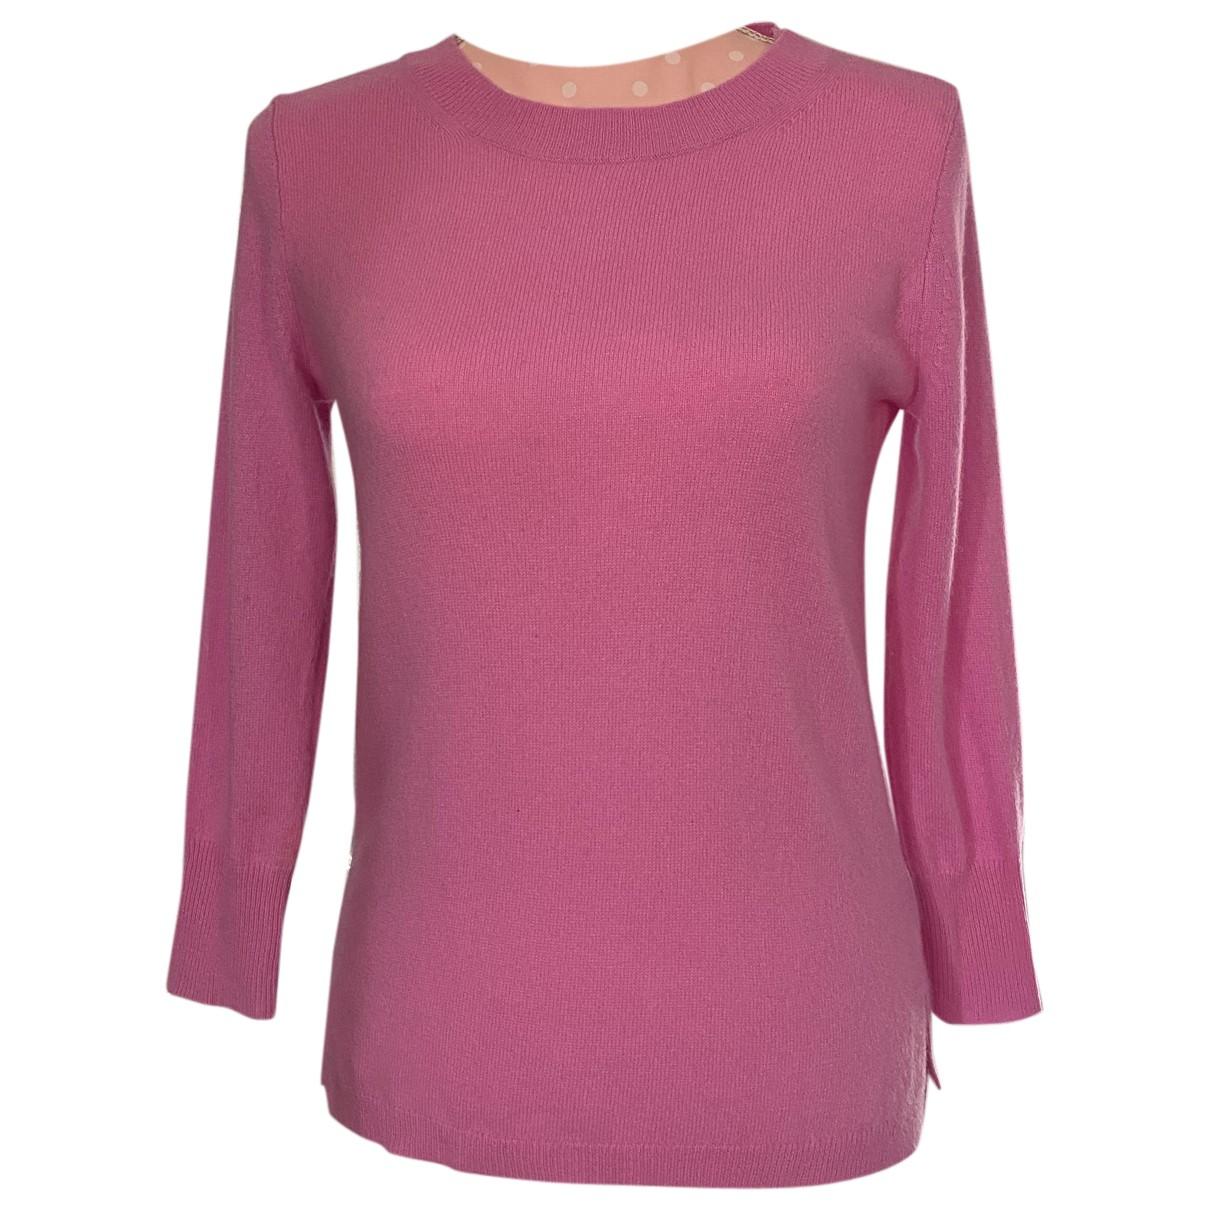 J.crew N Pink Cashmere Knitwear for Women XS International